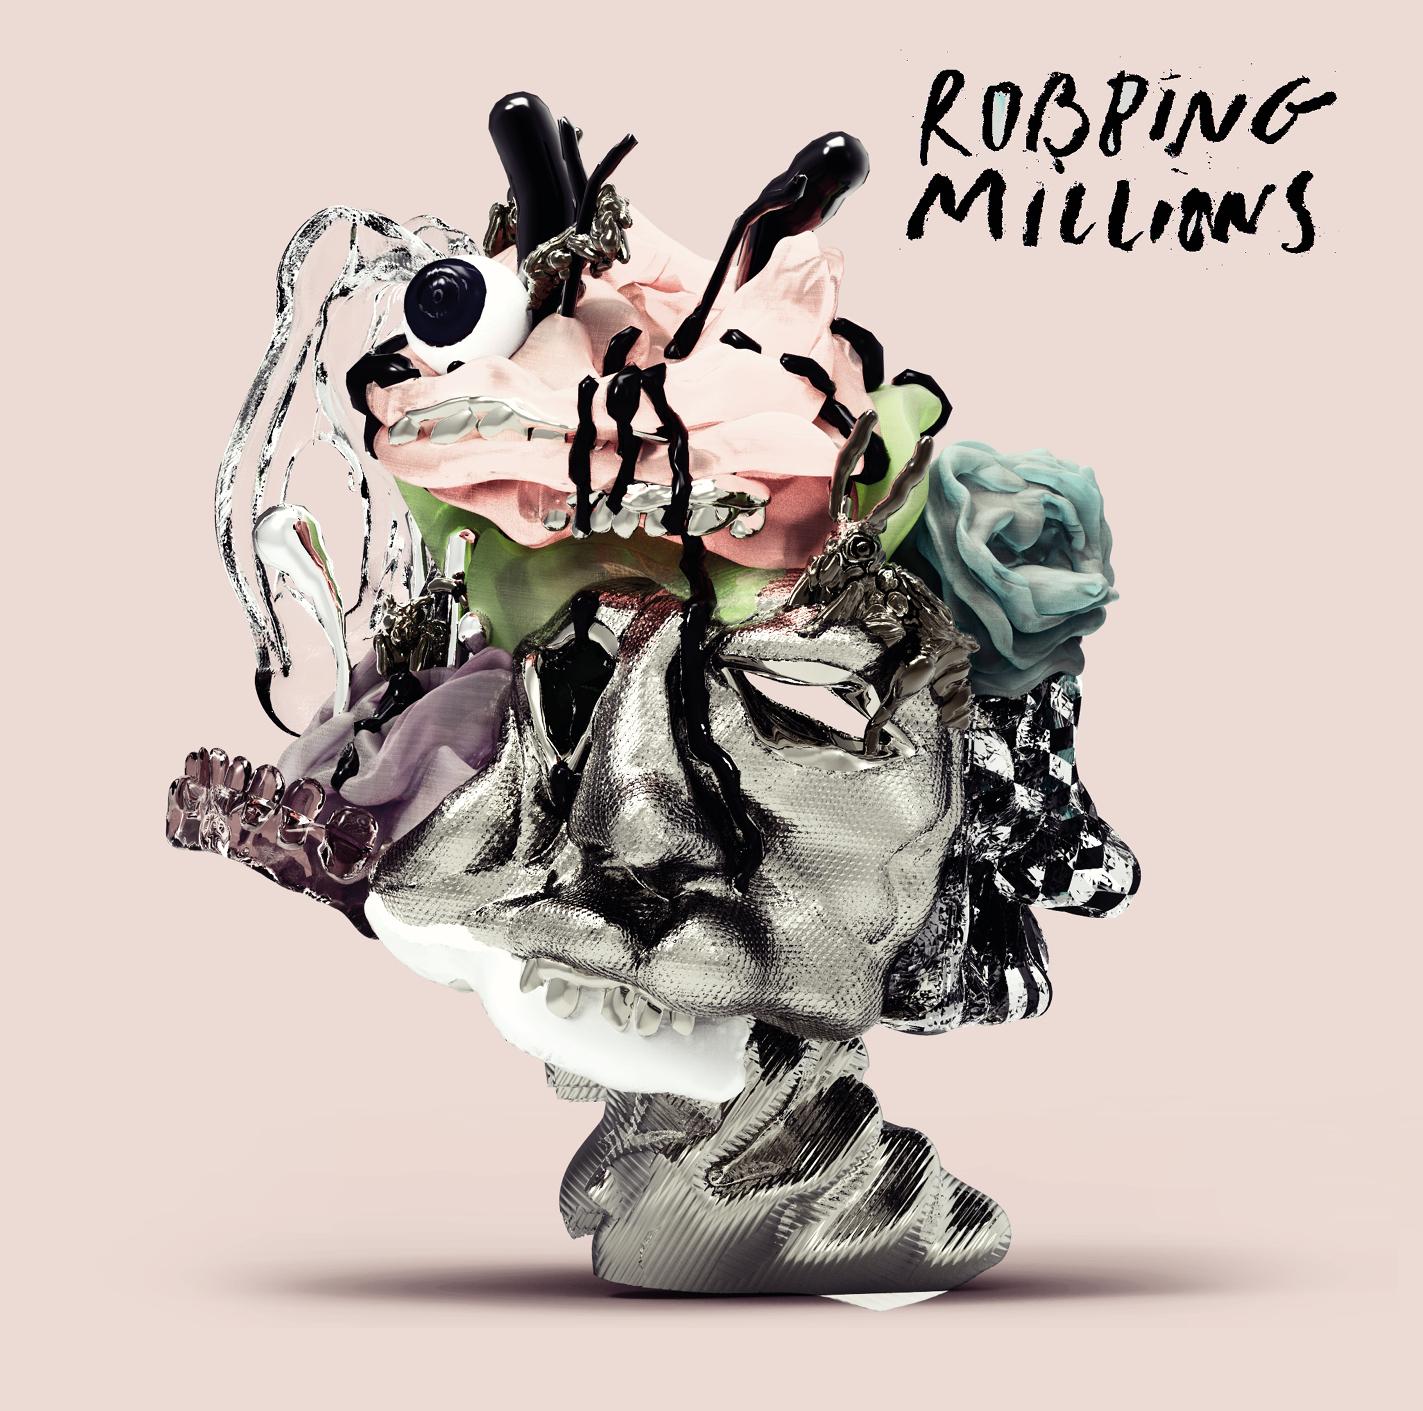 Robbing Millions – ROBBING MILLIONS